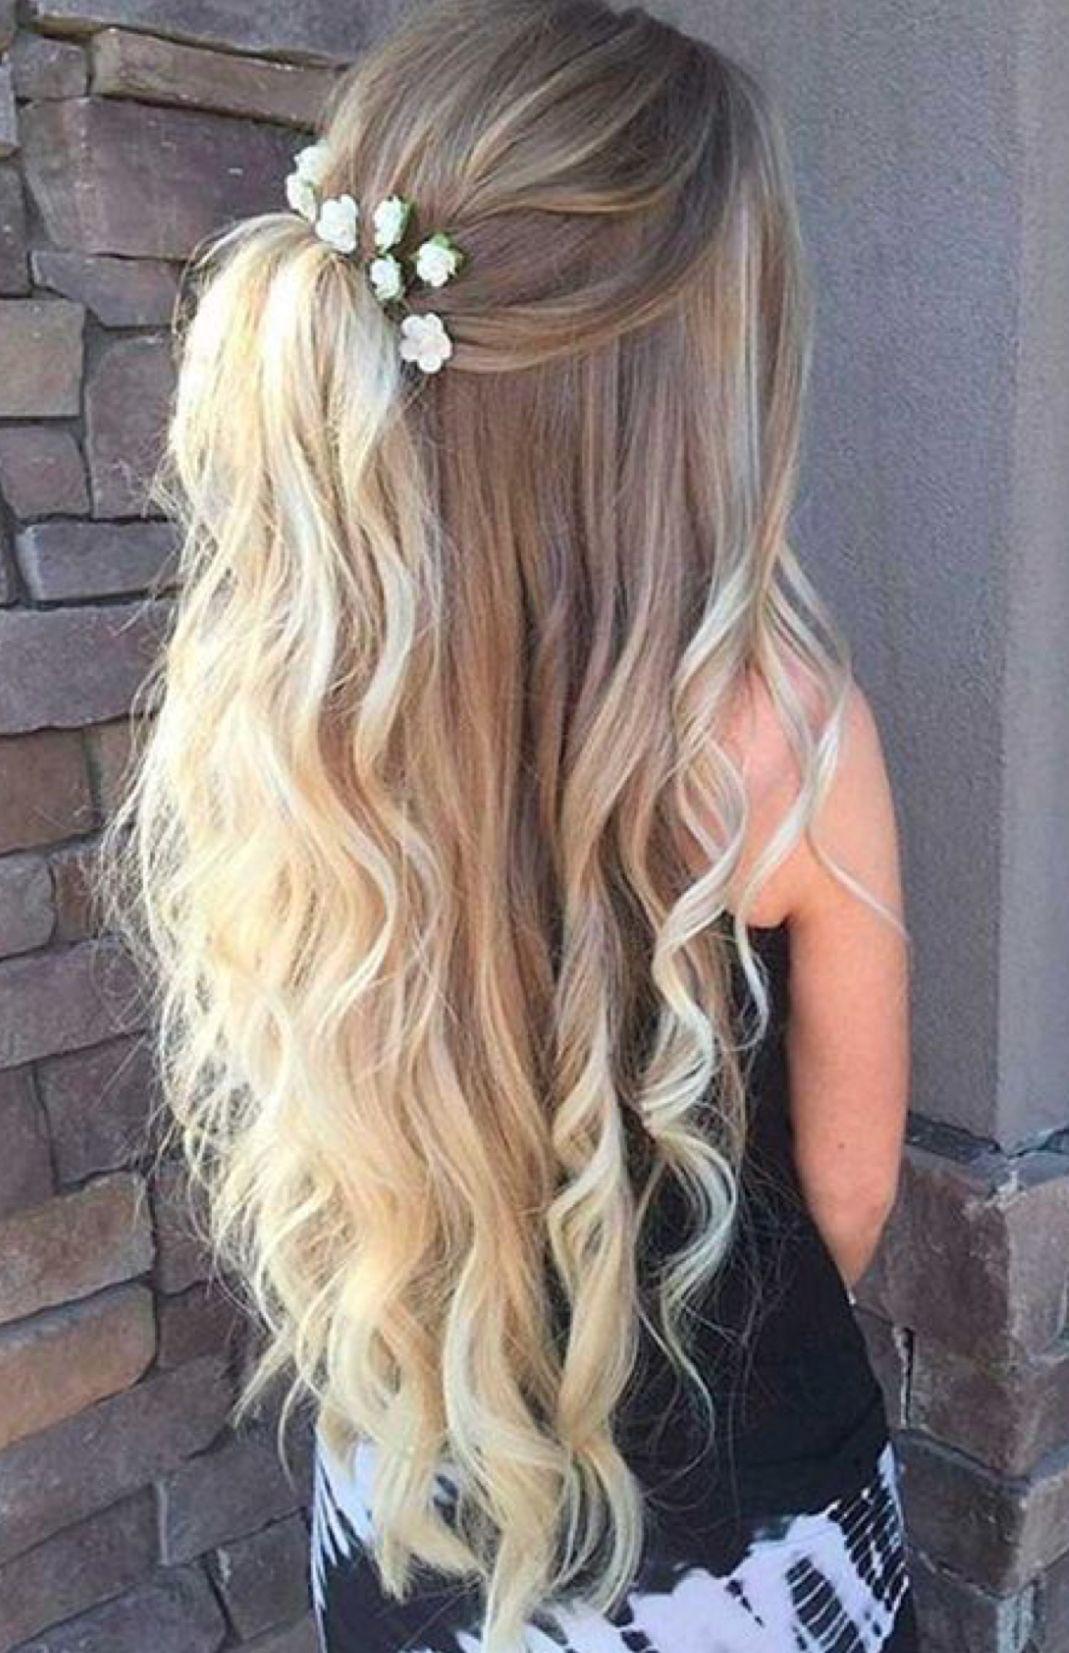 Women hairstyle ideas hair εїз pinterest woman hairstyles